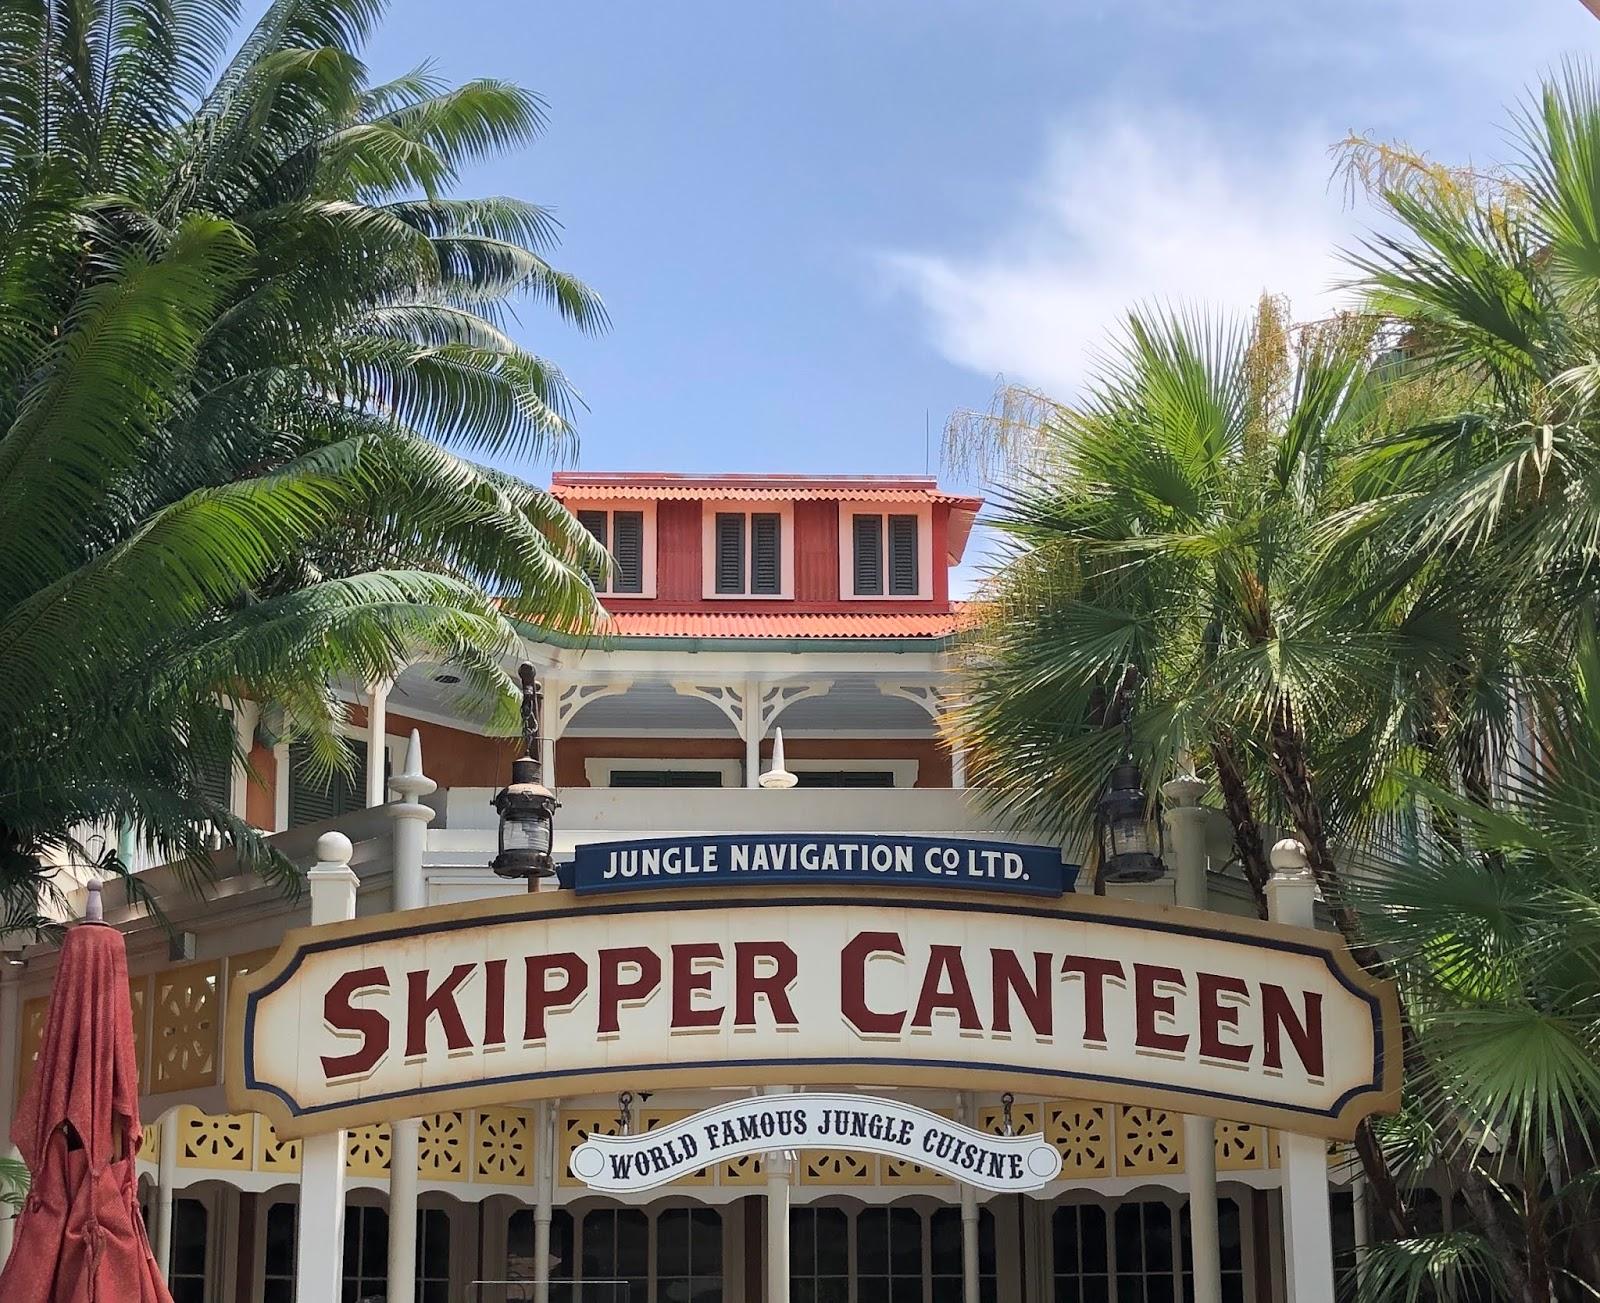 Alexis's Gluten Free Adventures: Jungle Navigation Co. LTD Skipper Canteen  - Magic Kingdom